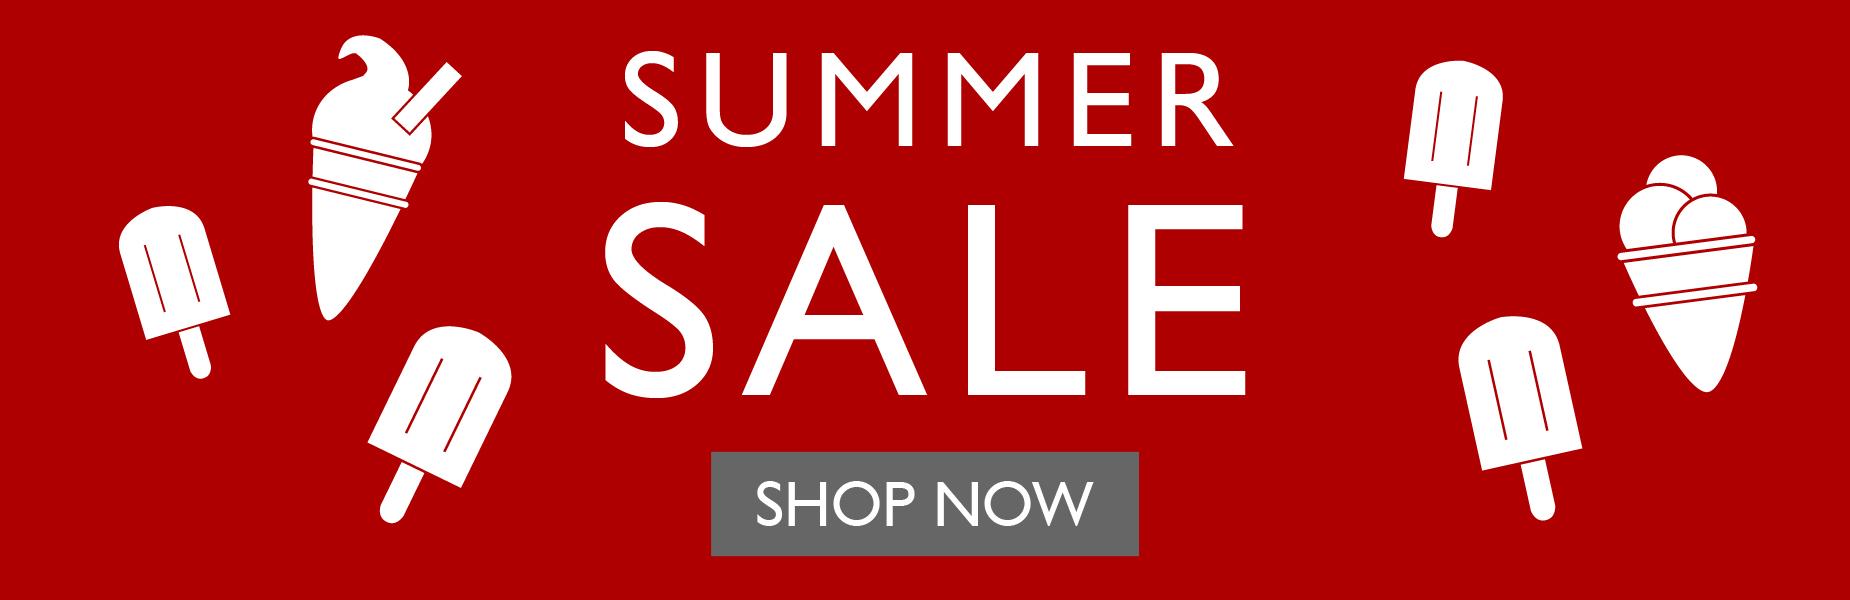 Summer Sale SS21 | Shop Now